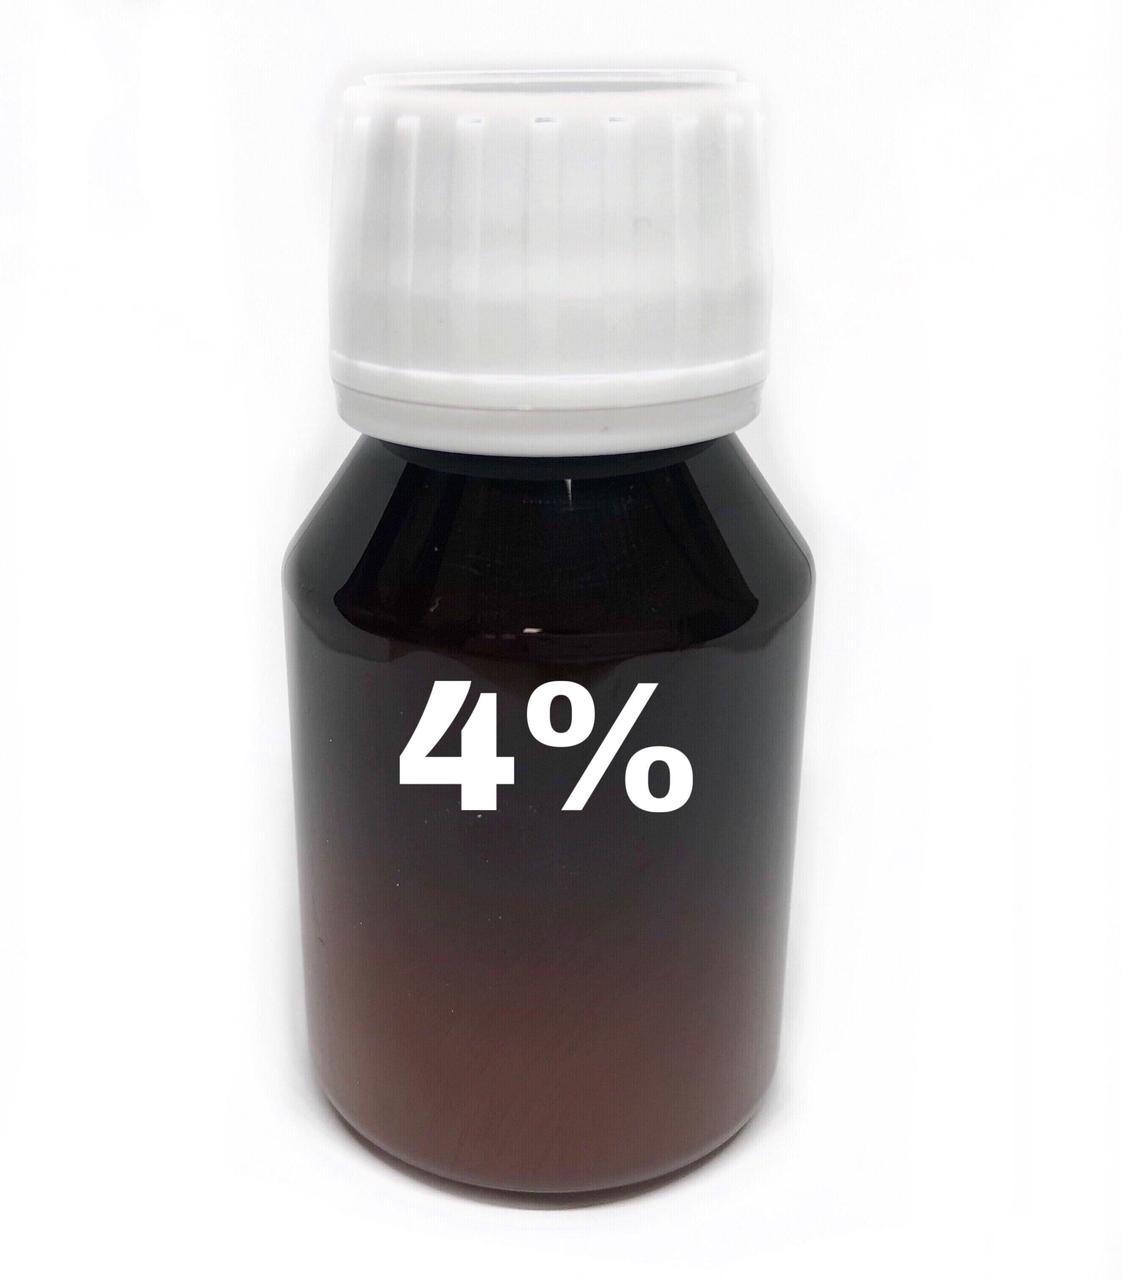 Эмульсия 4% Wella Color Touch Plus (разлив) 60 мл